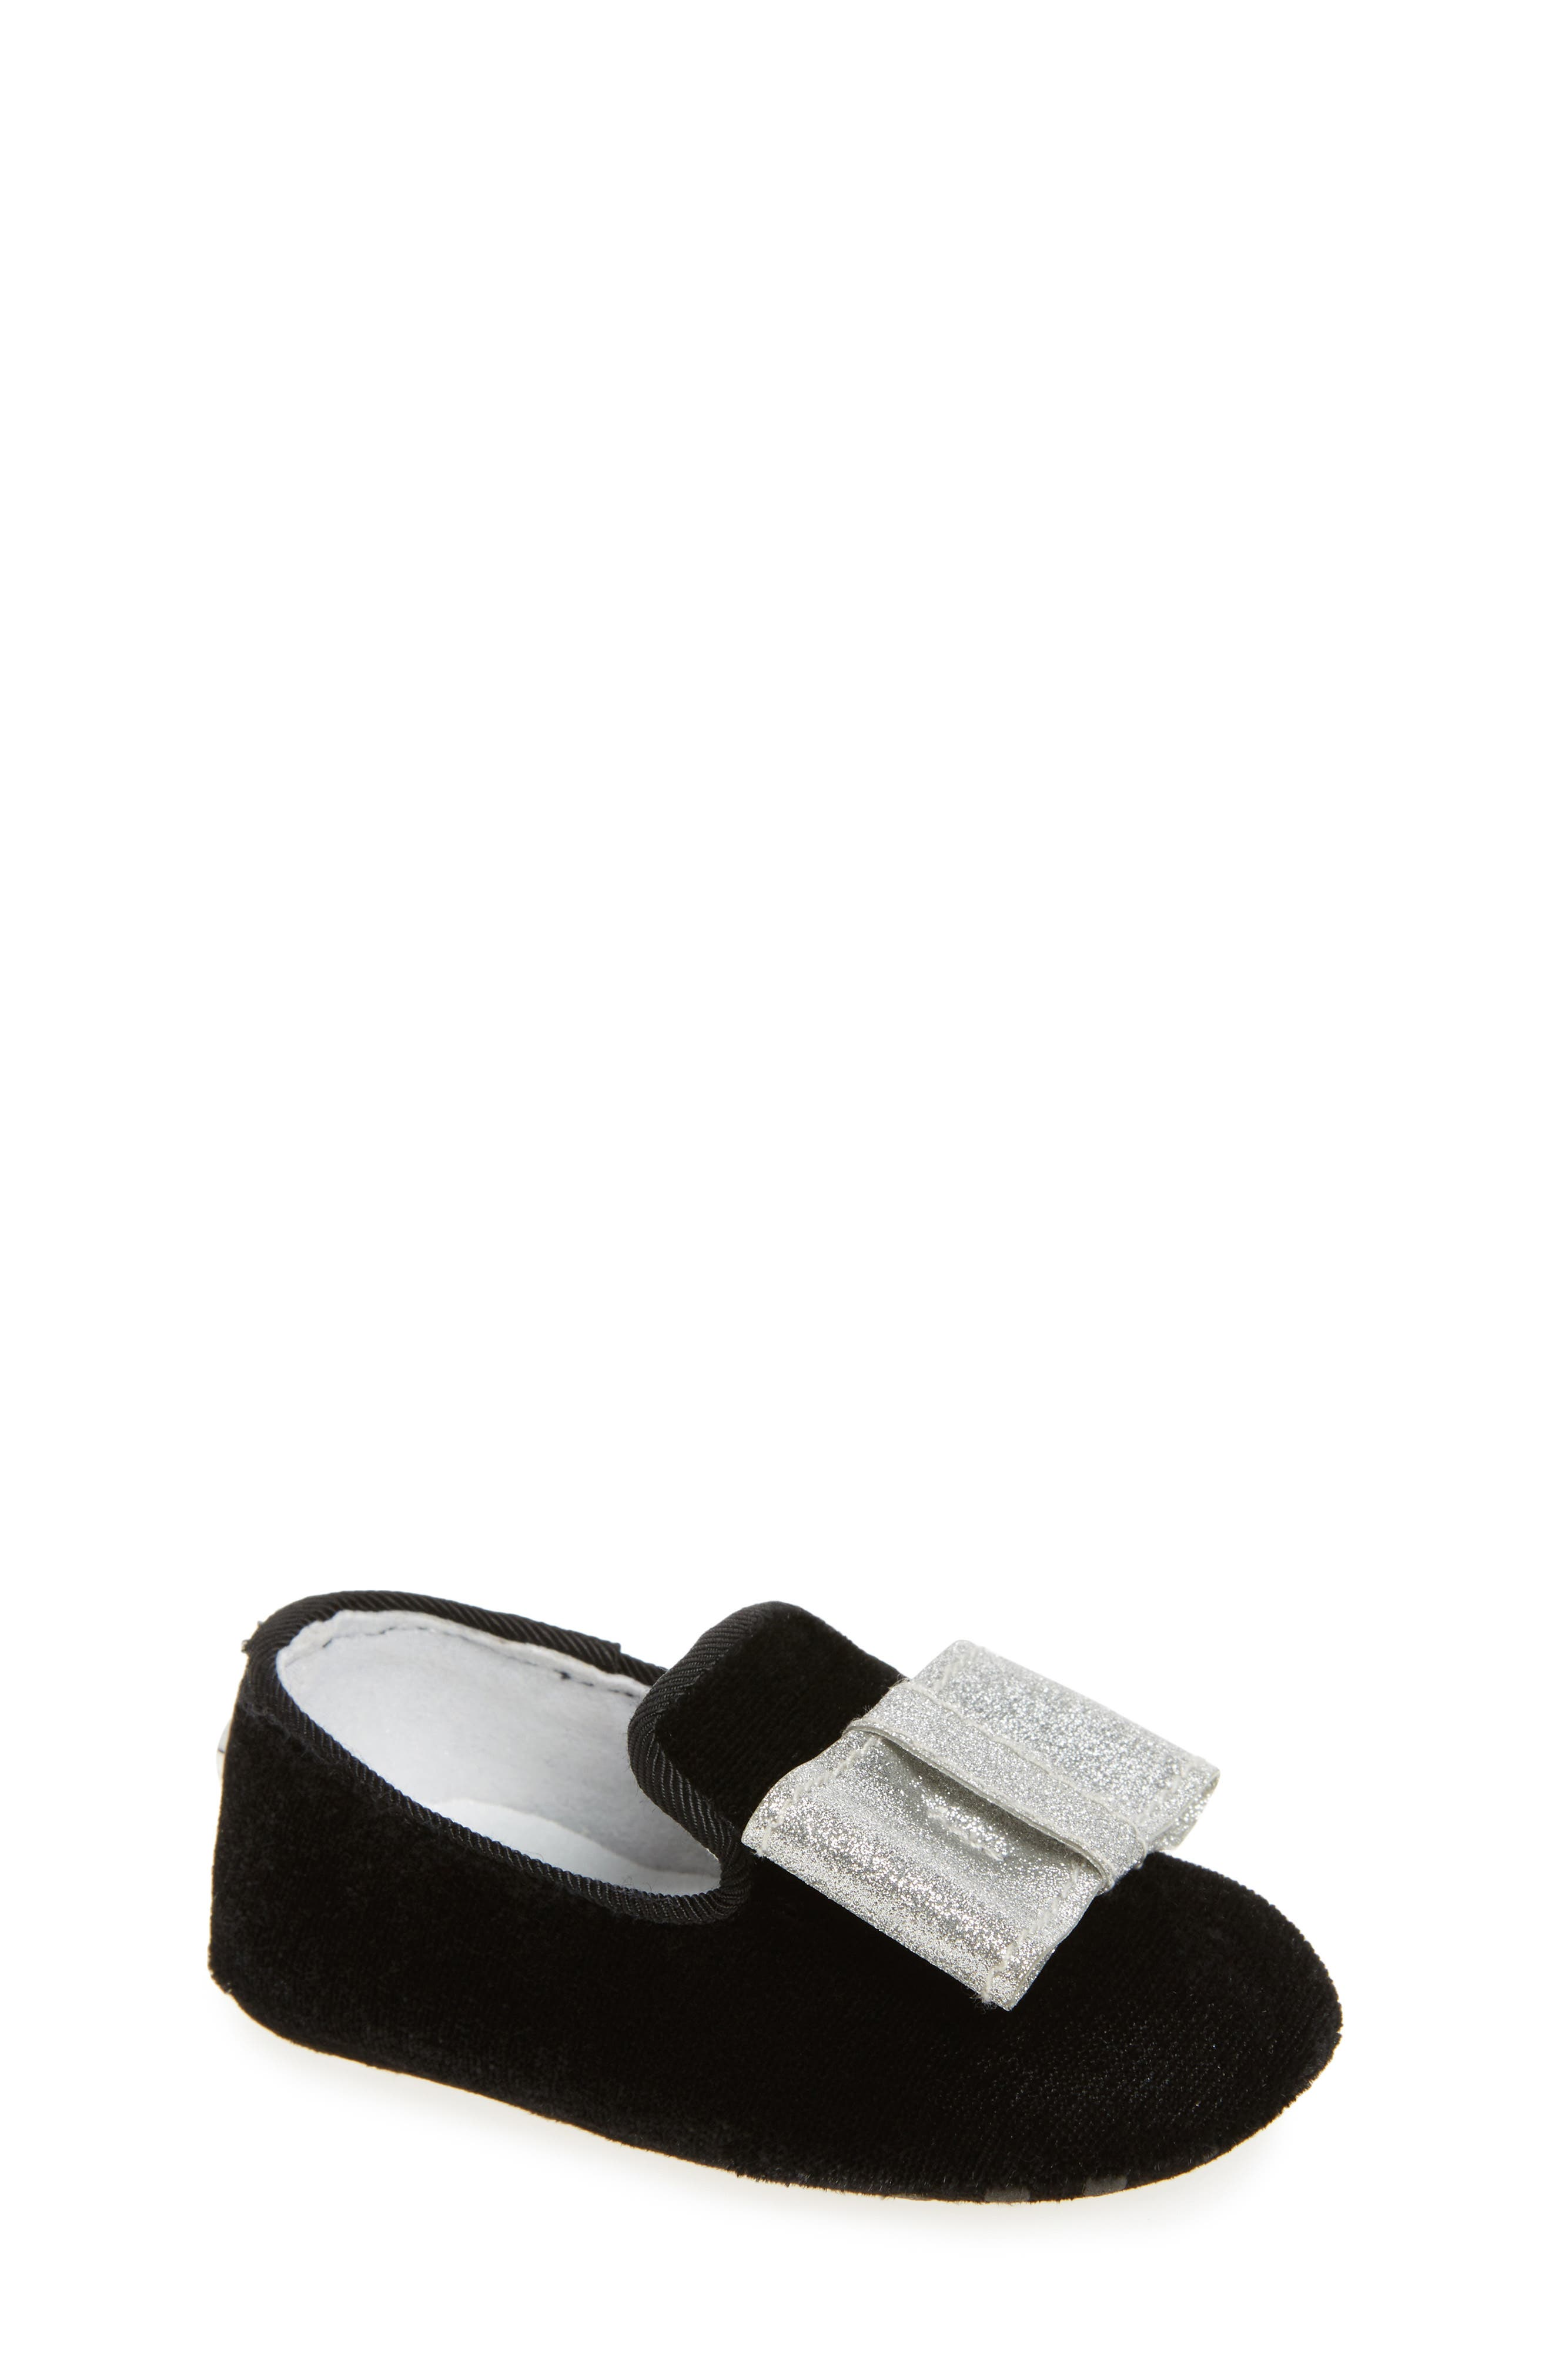 Bow Loafer Crib Shoe,                             Main thumbnail 1, color,                             012